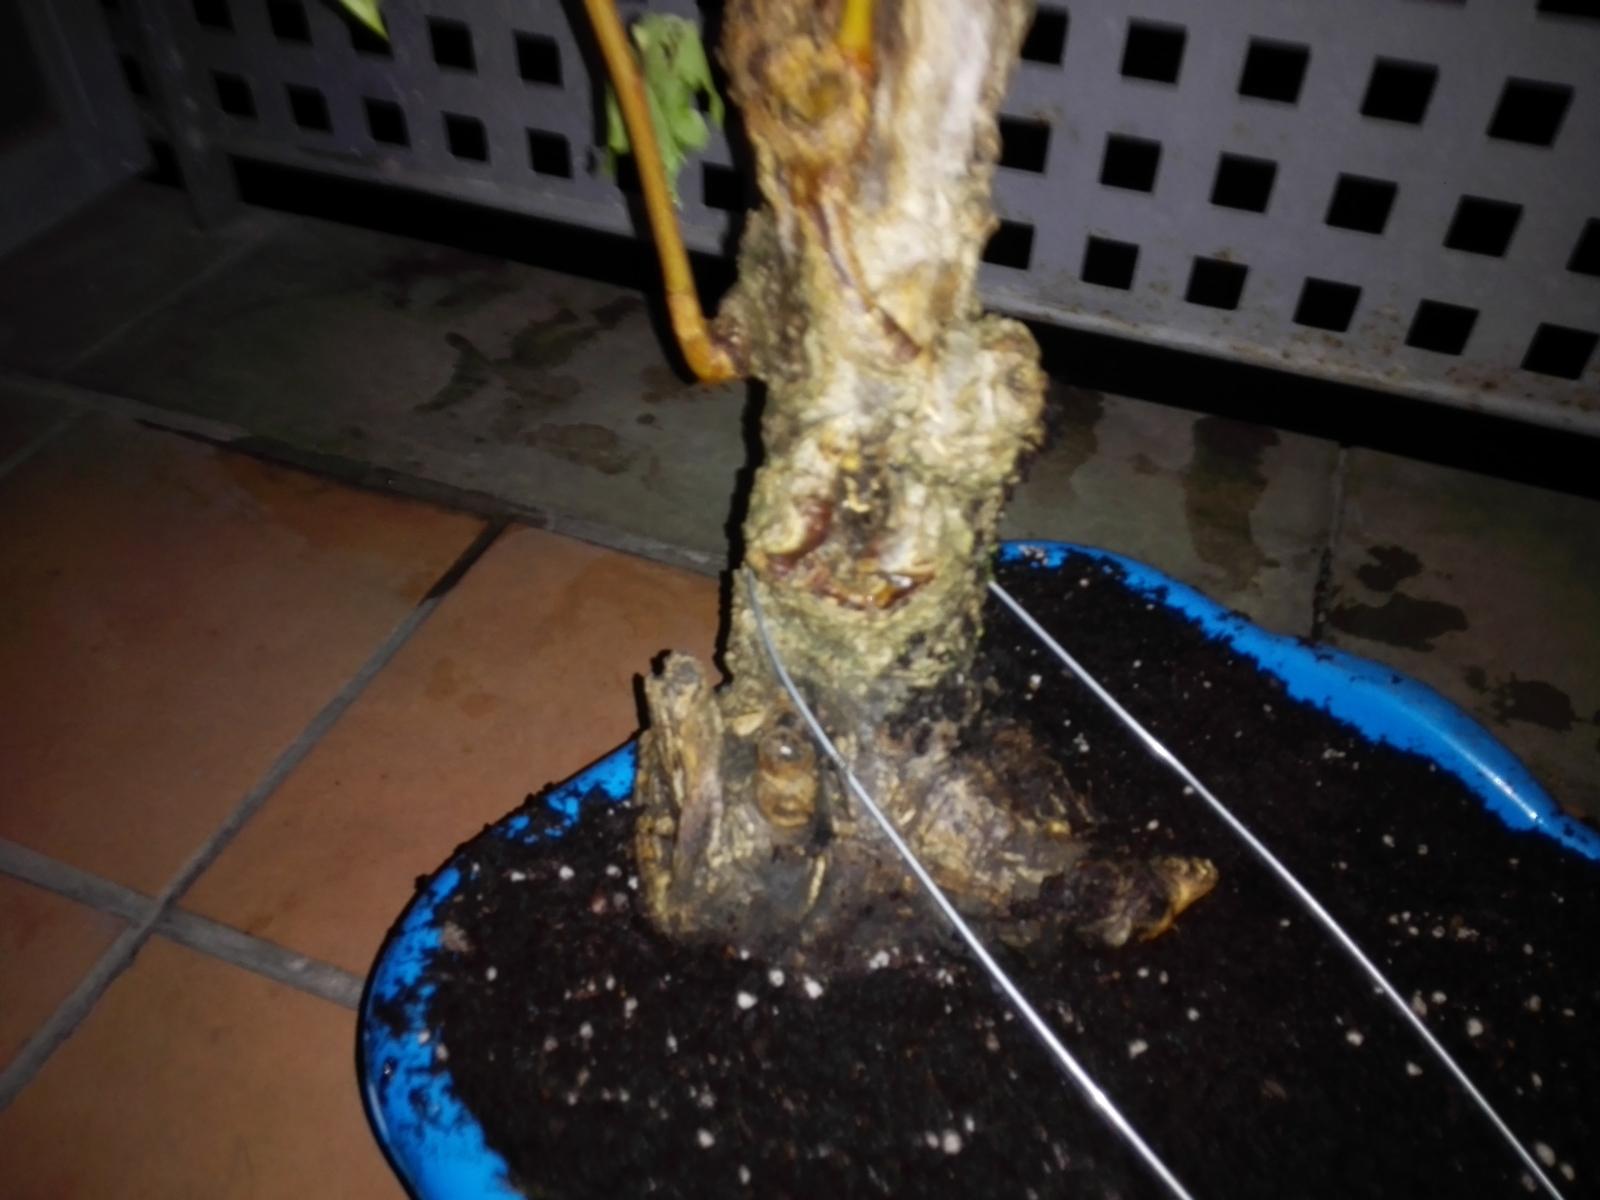 Recuperación, ailanthus altissima? 4qjyu1